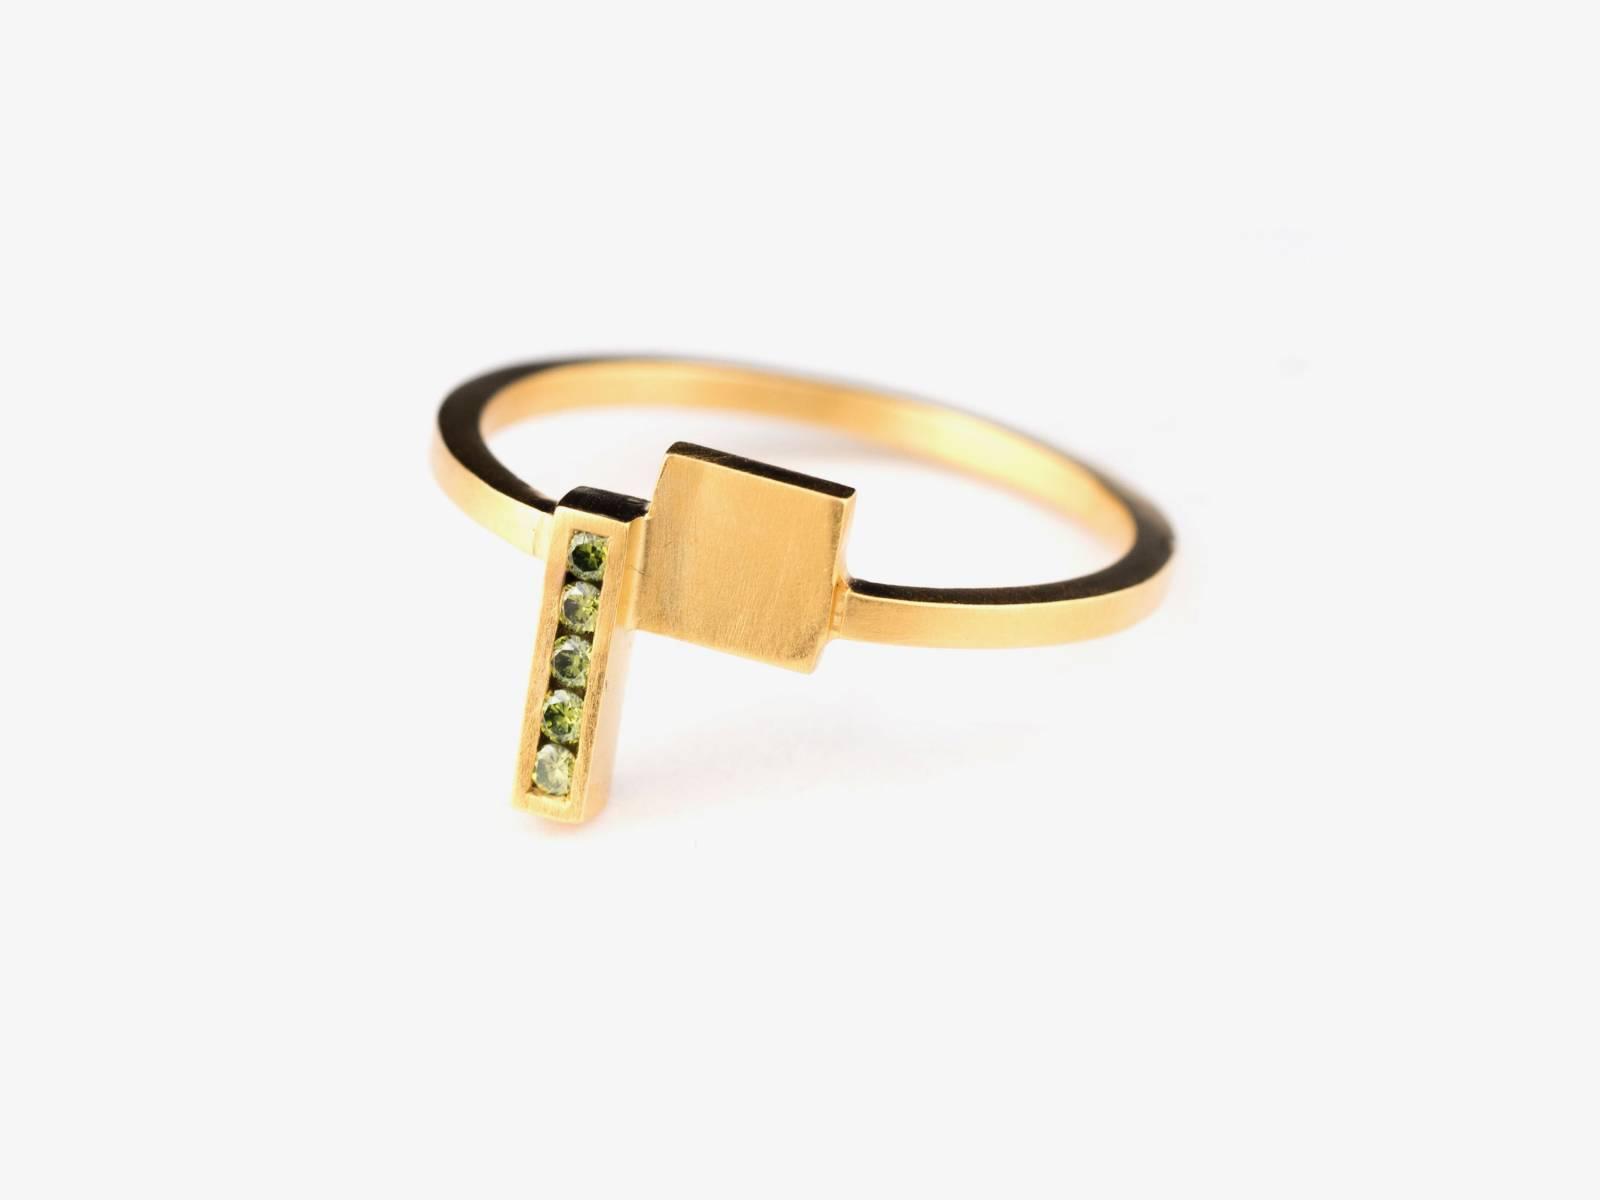 LUX_yugen ring 18K au- olive diamant